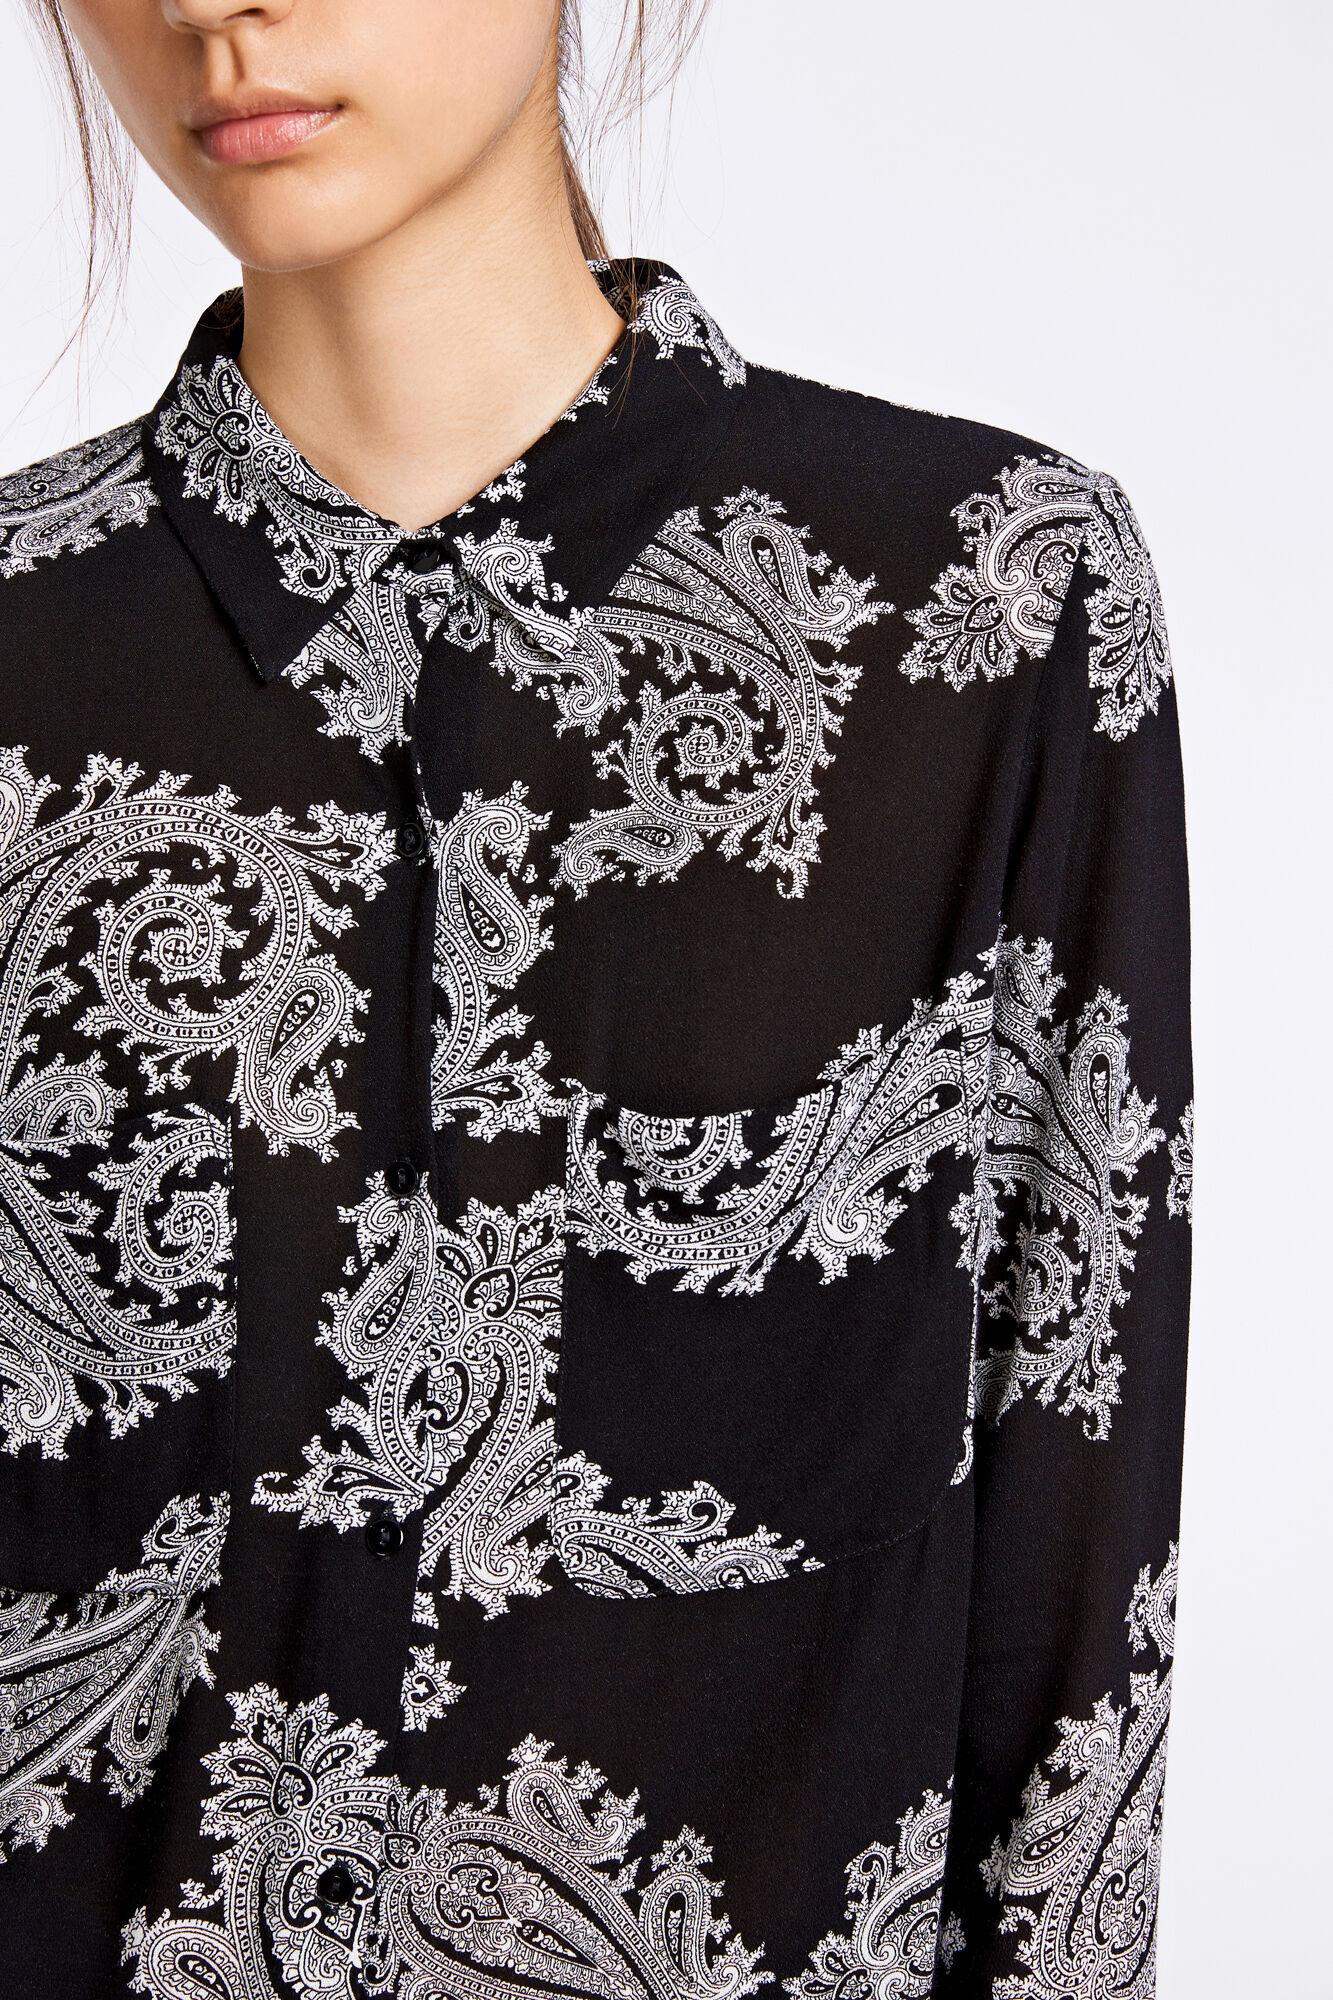 Milly shirt aop 7201, GRAND MOTIF